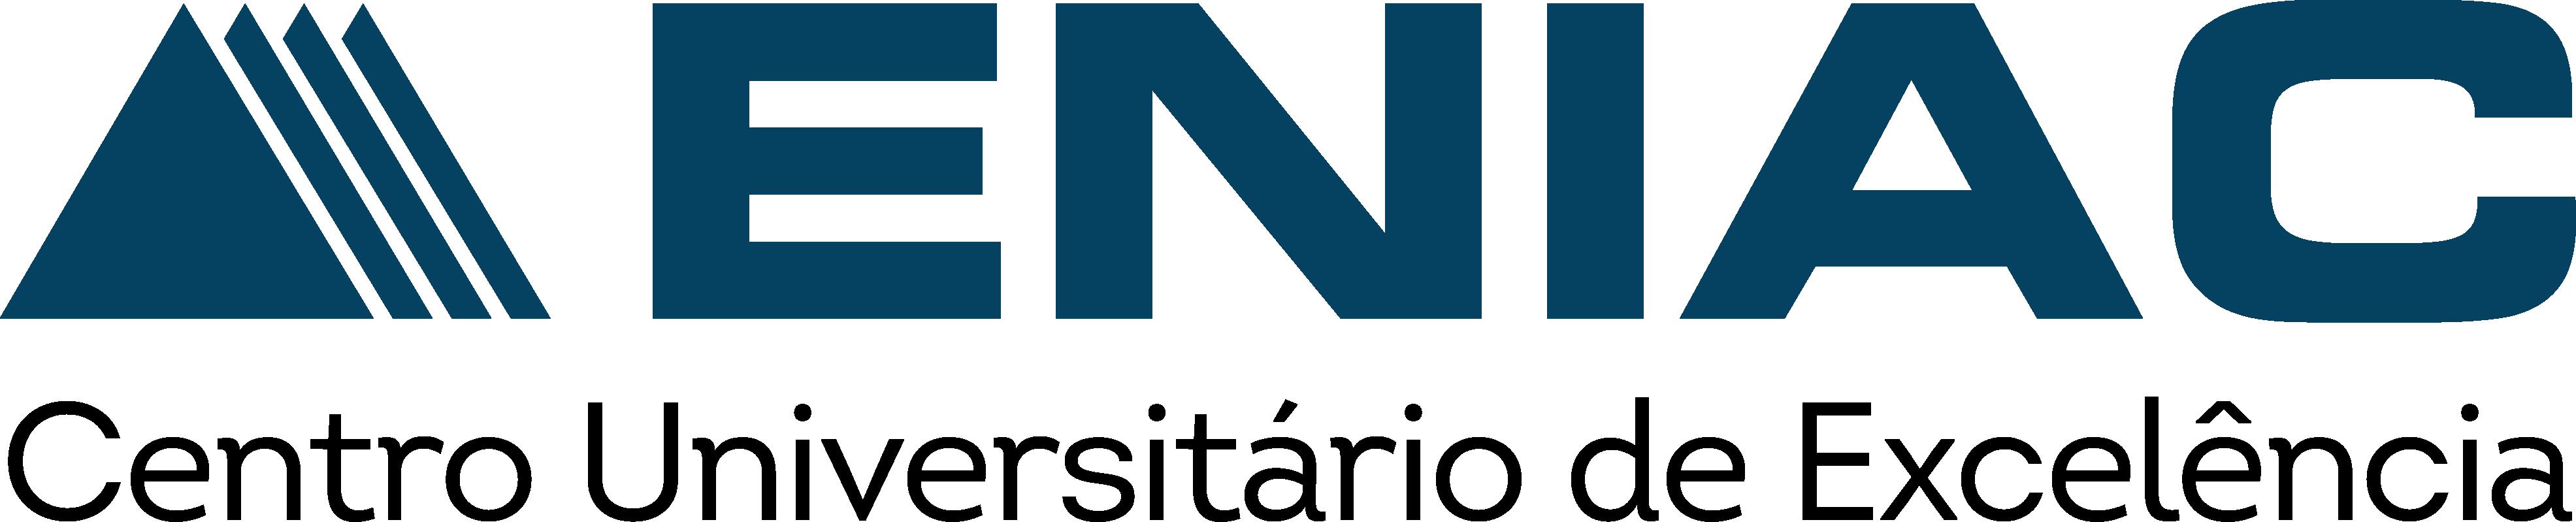 logos_eniac_centro_universitario-1